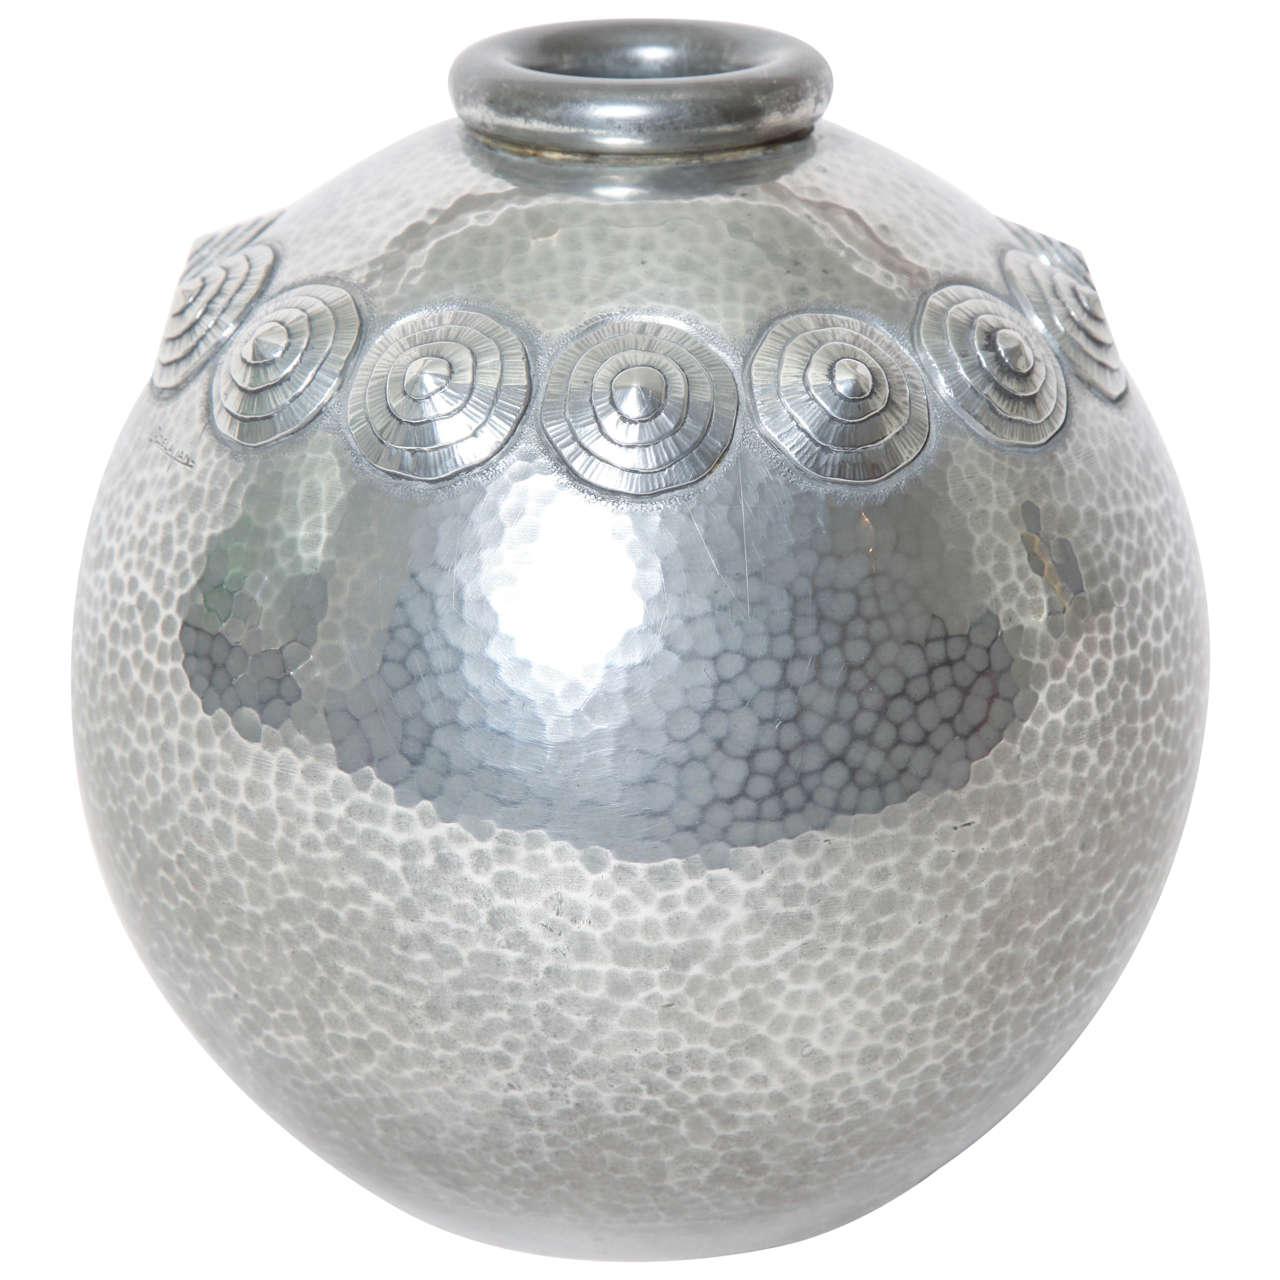 Rene Delavan French Art Deco Pewter Dinanderie Vase